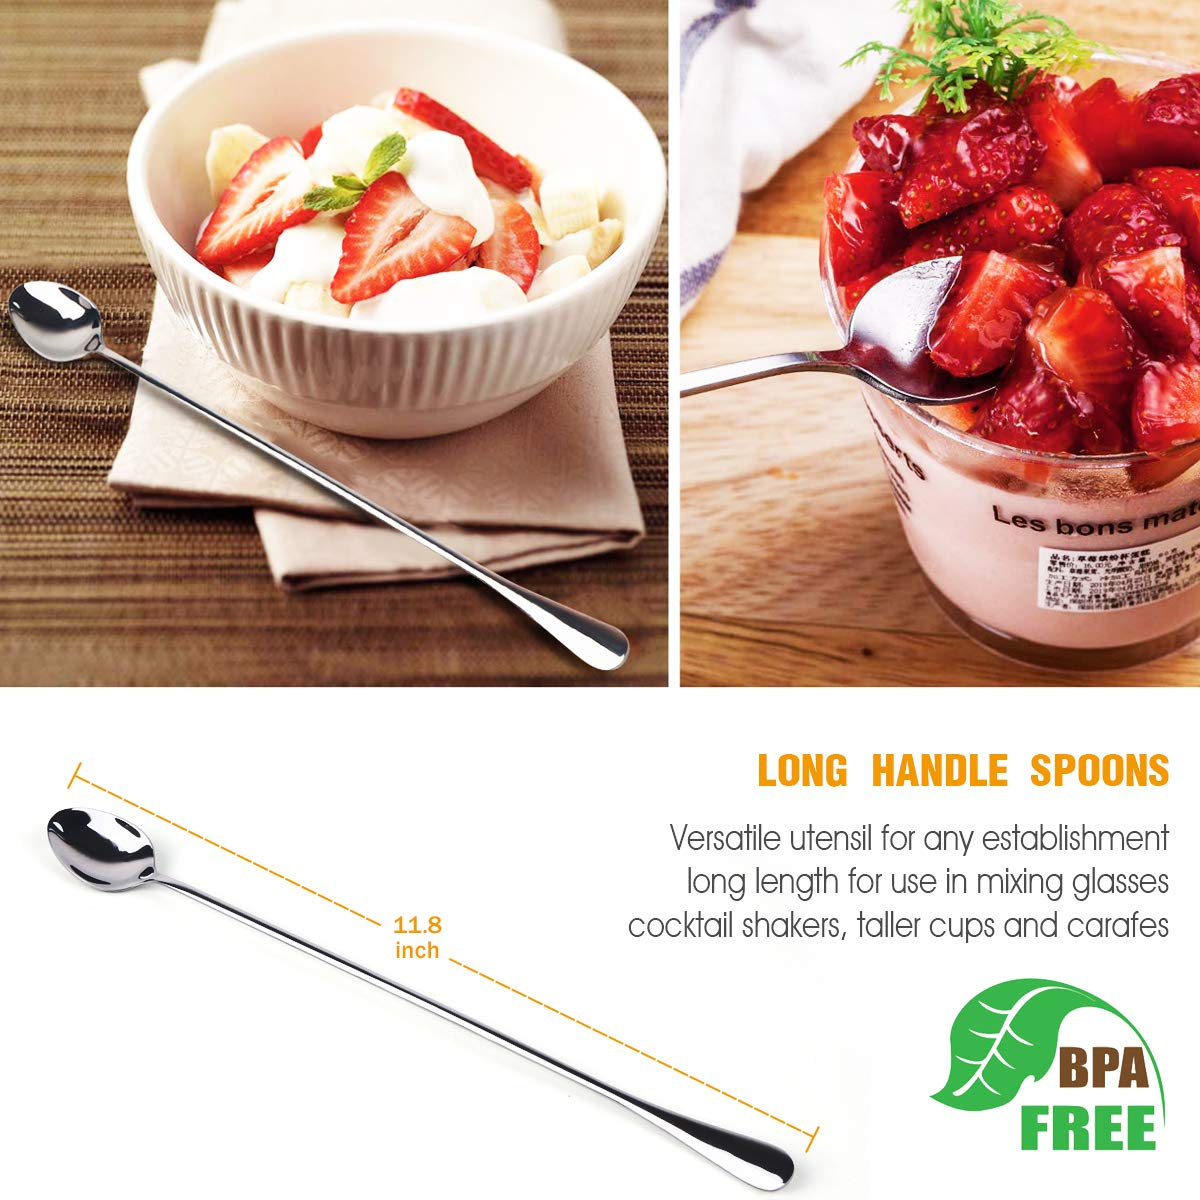 Silverware Flatware Cutlery Set,Portable Utensils LPOLER 32 Pieces Stainless Steel